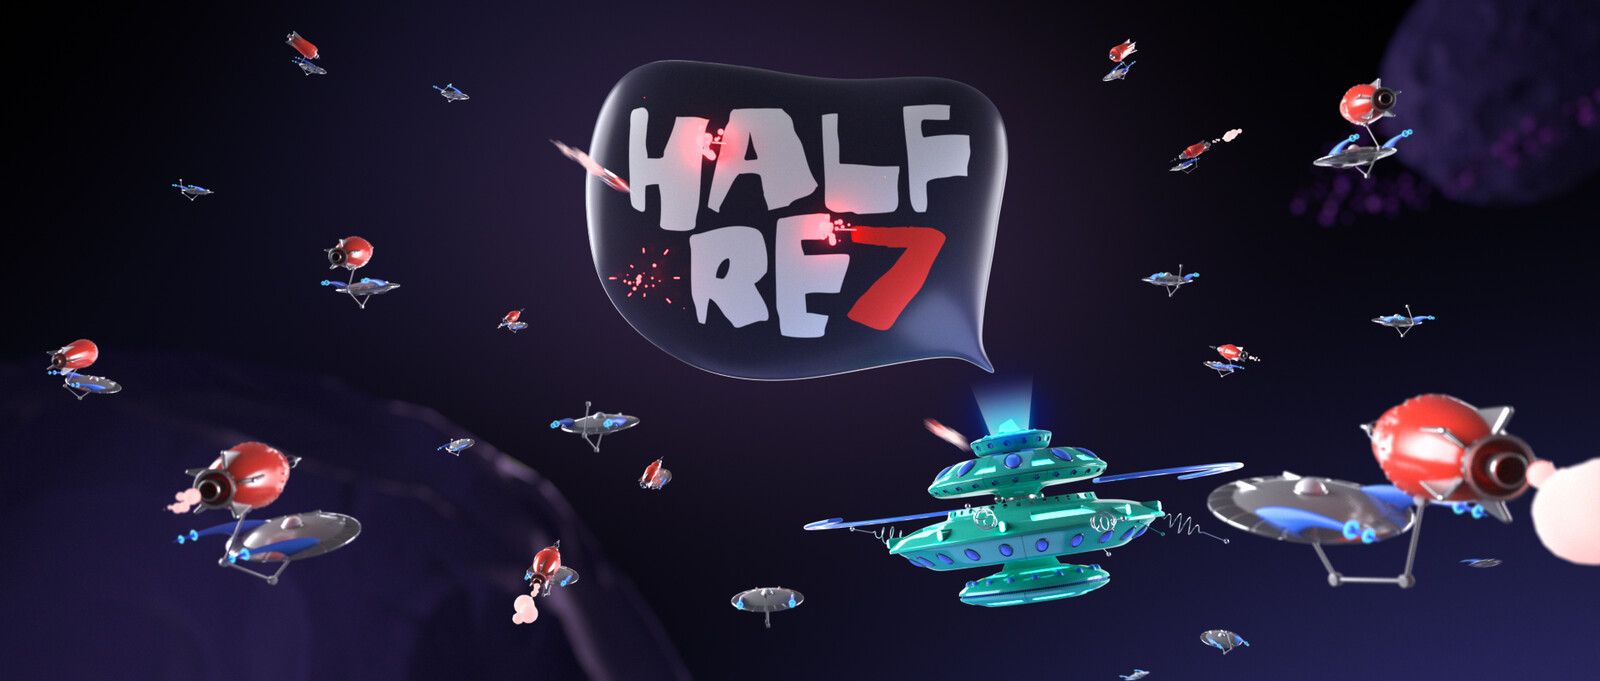 Half Rez 7 - Mothership Bumper